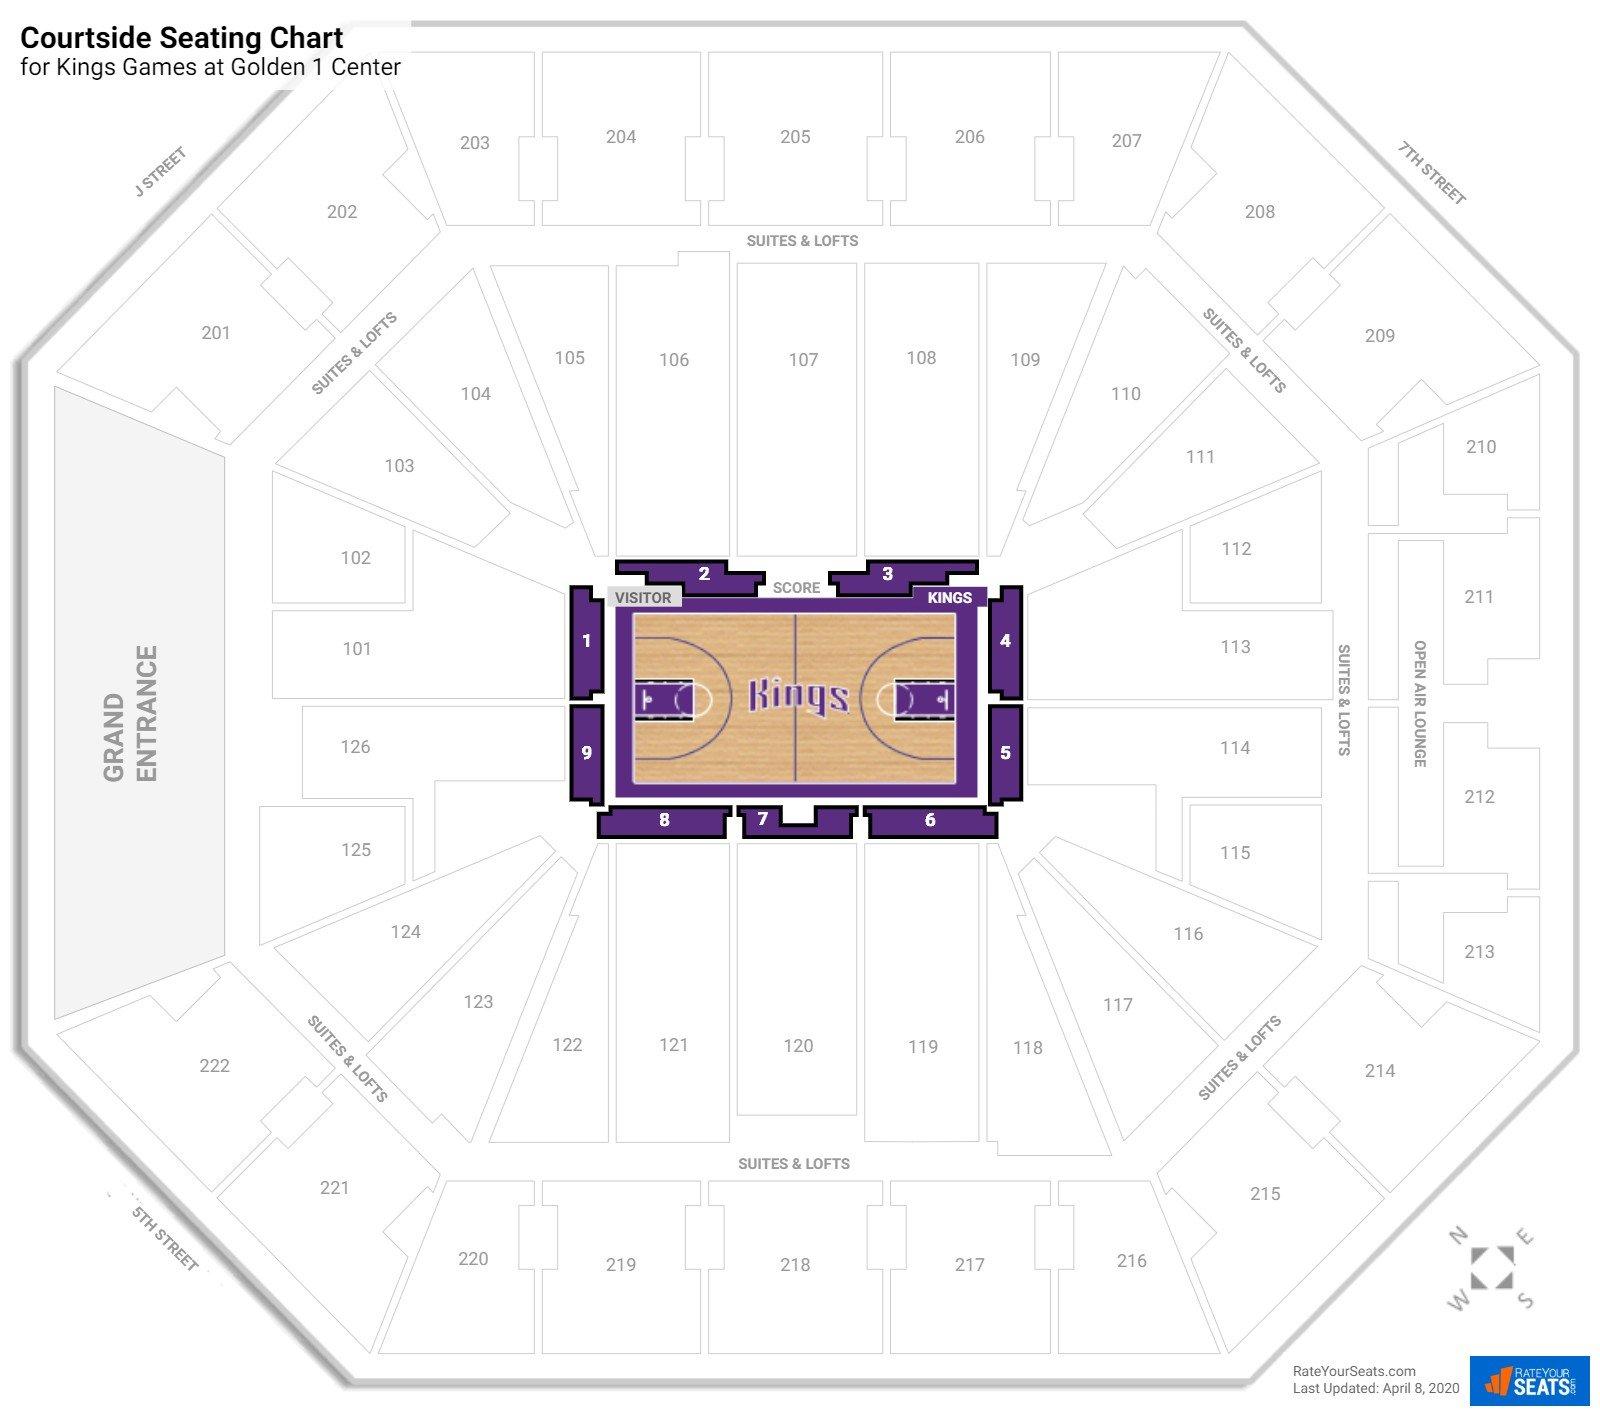 Golden 1 Center Courtside Seating Chart